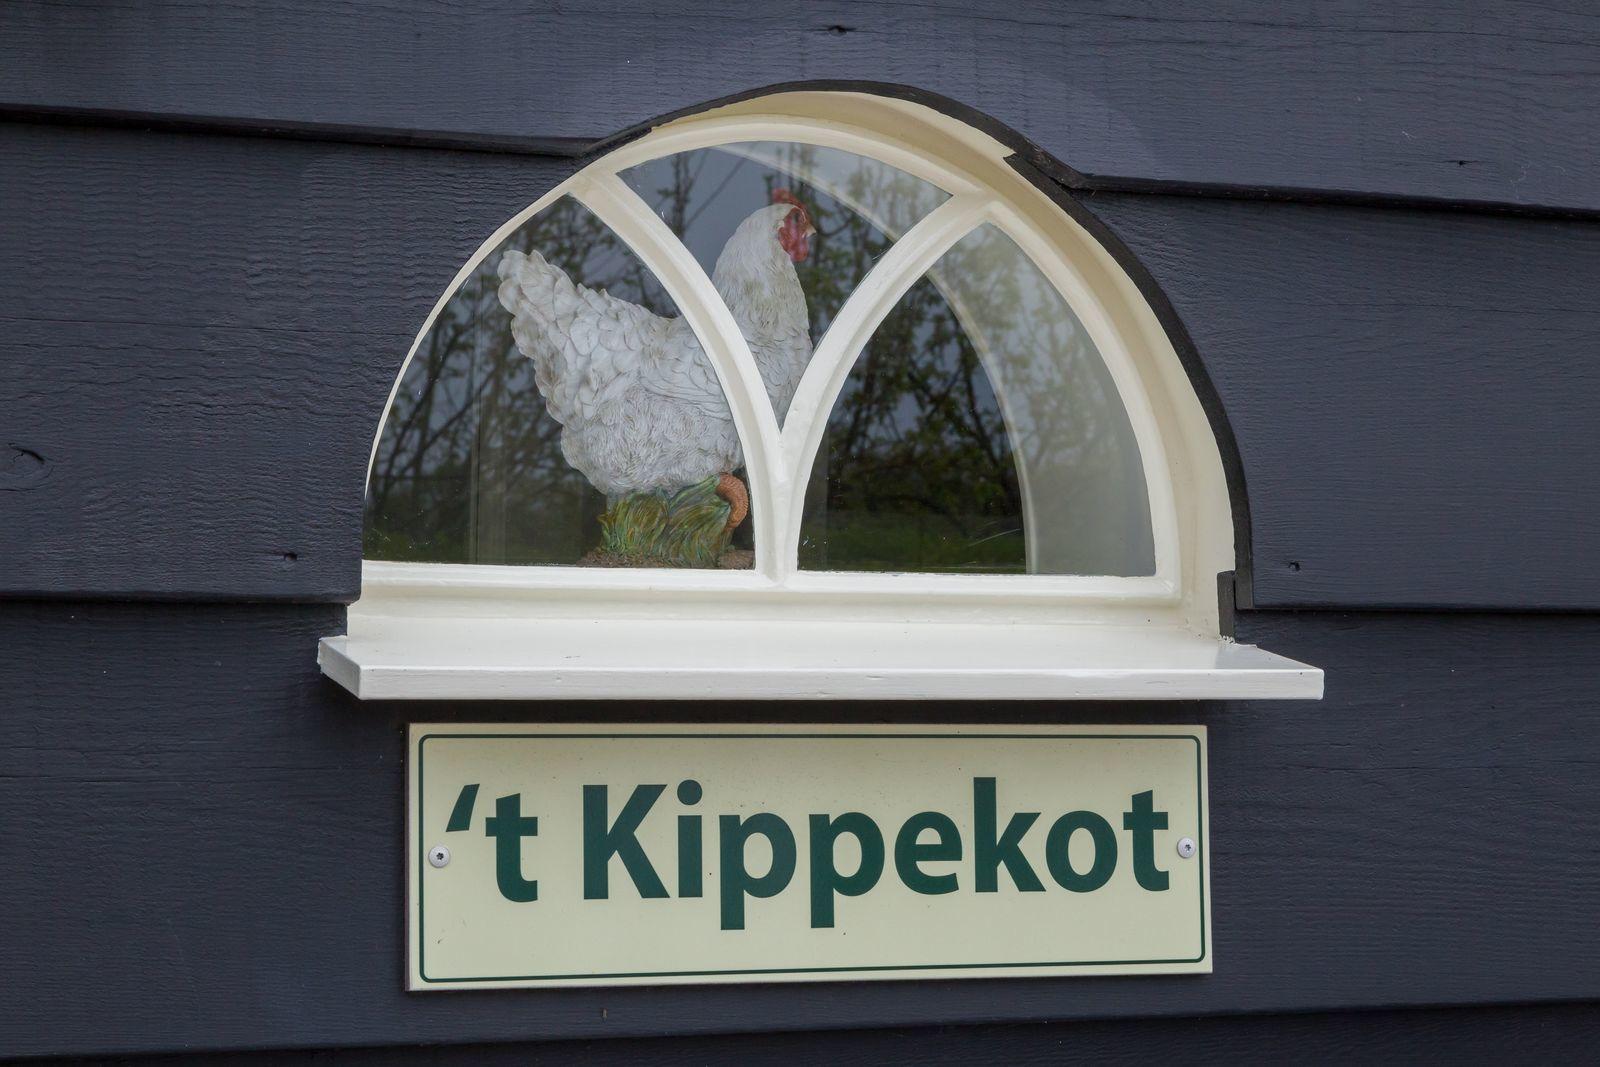 "Ferienhaus - Prelaatweg 11 | Westkapelle 't Kippekot"""